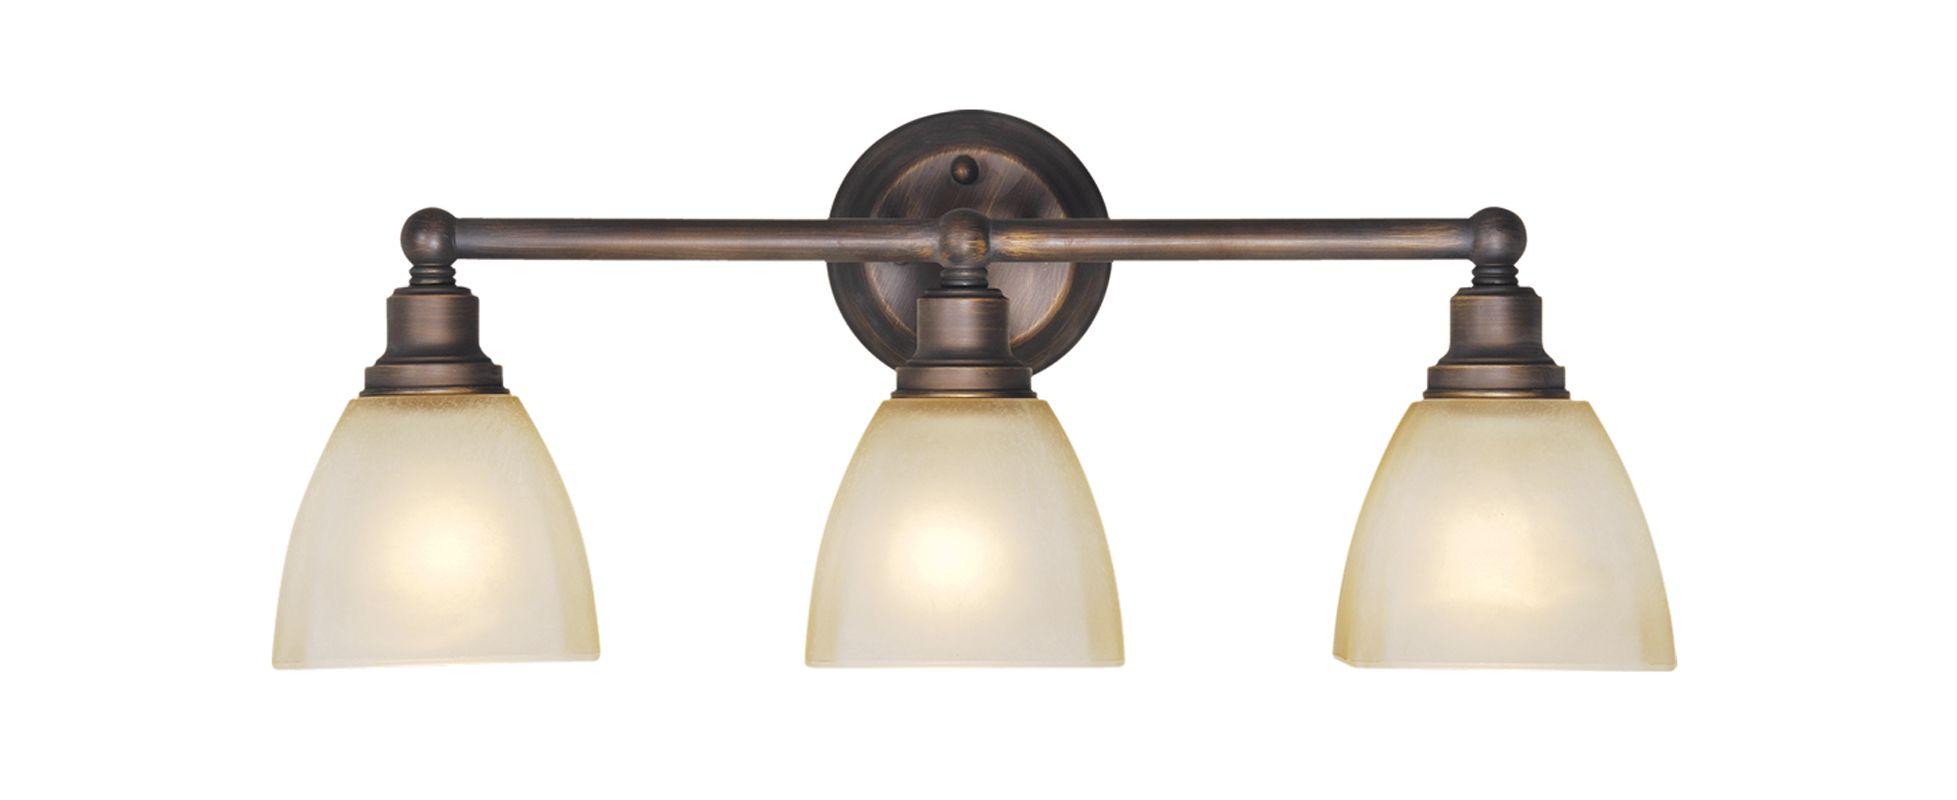 Jeremiah Lighting 26603 Bradley 3 Light Bathroom Vanity Light - 23.5 Sale $129.00 ITEM: bci1554490 ID#:26603-BZ UPC: 80629804623 :